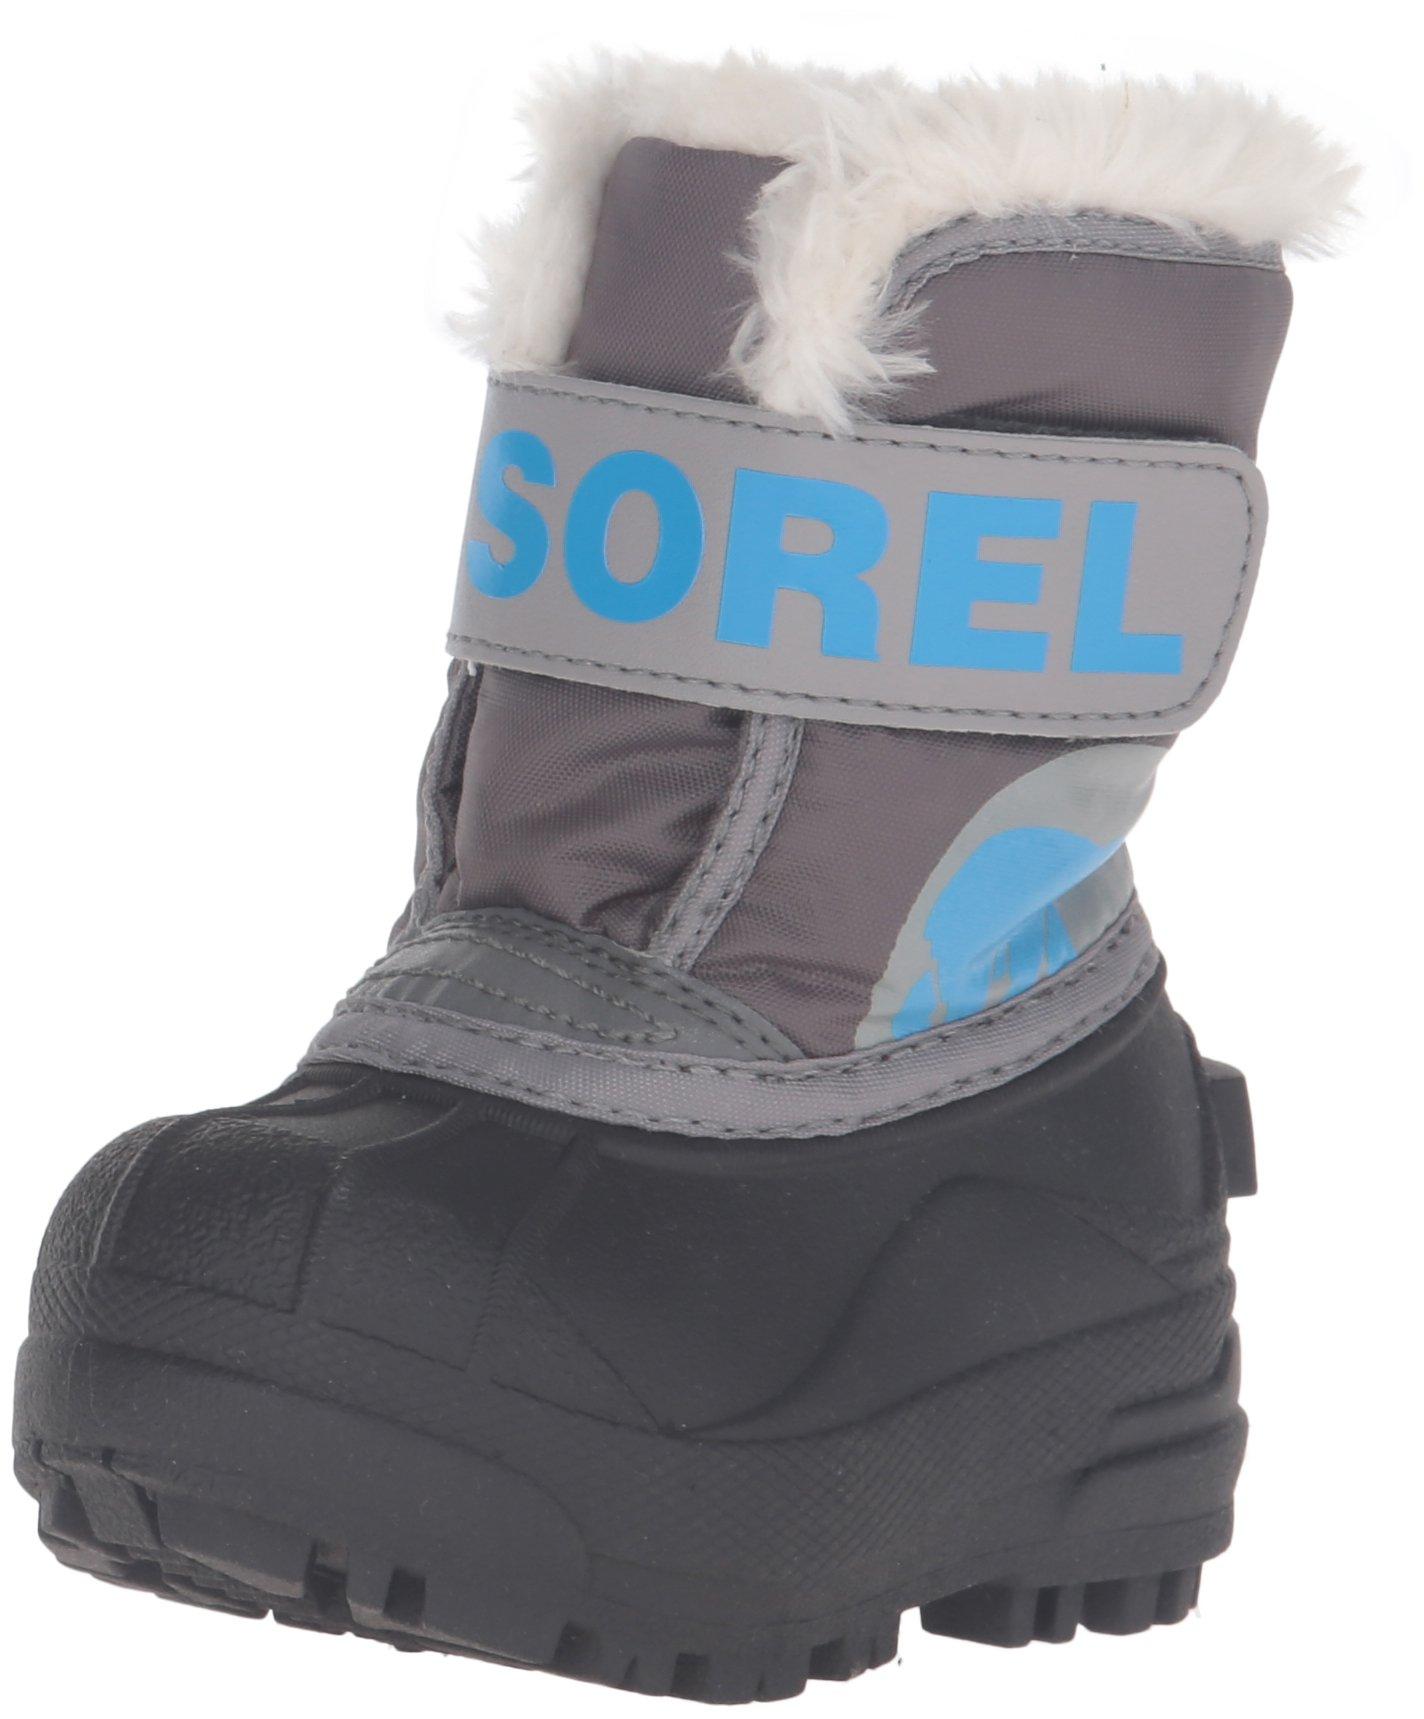 Sorel Commander-K Snow Boot, Dark Fog/Light Grey, 5 M US Toddler